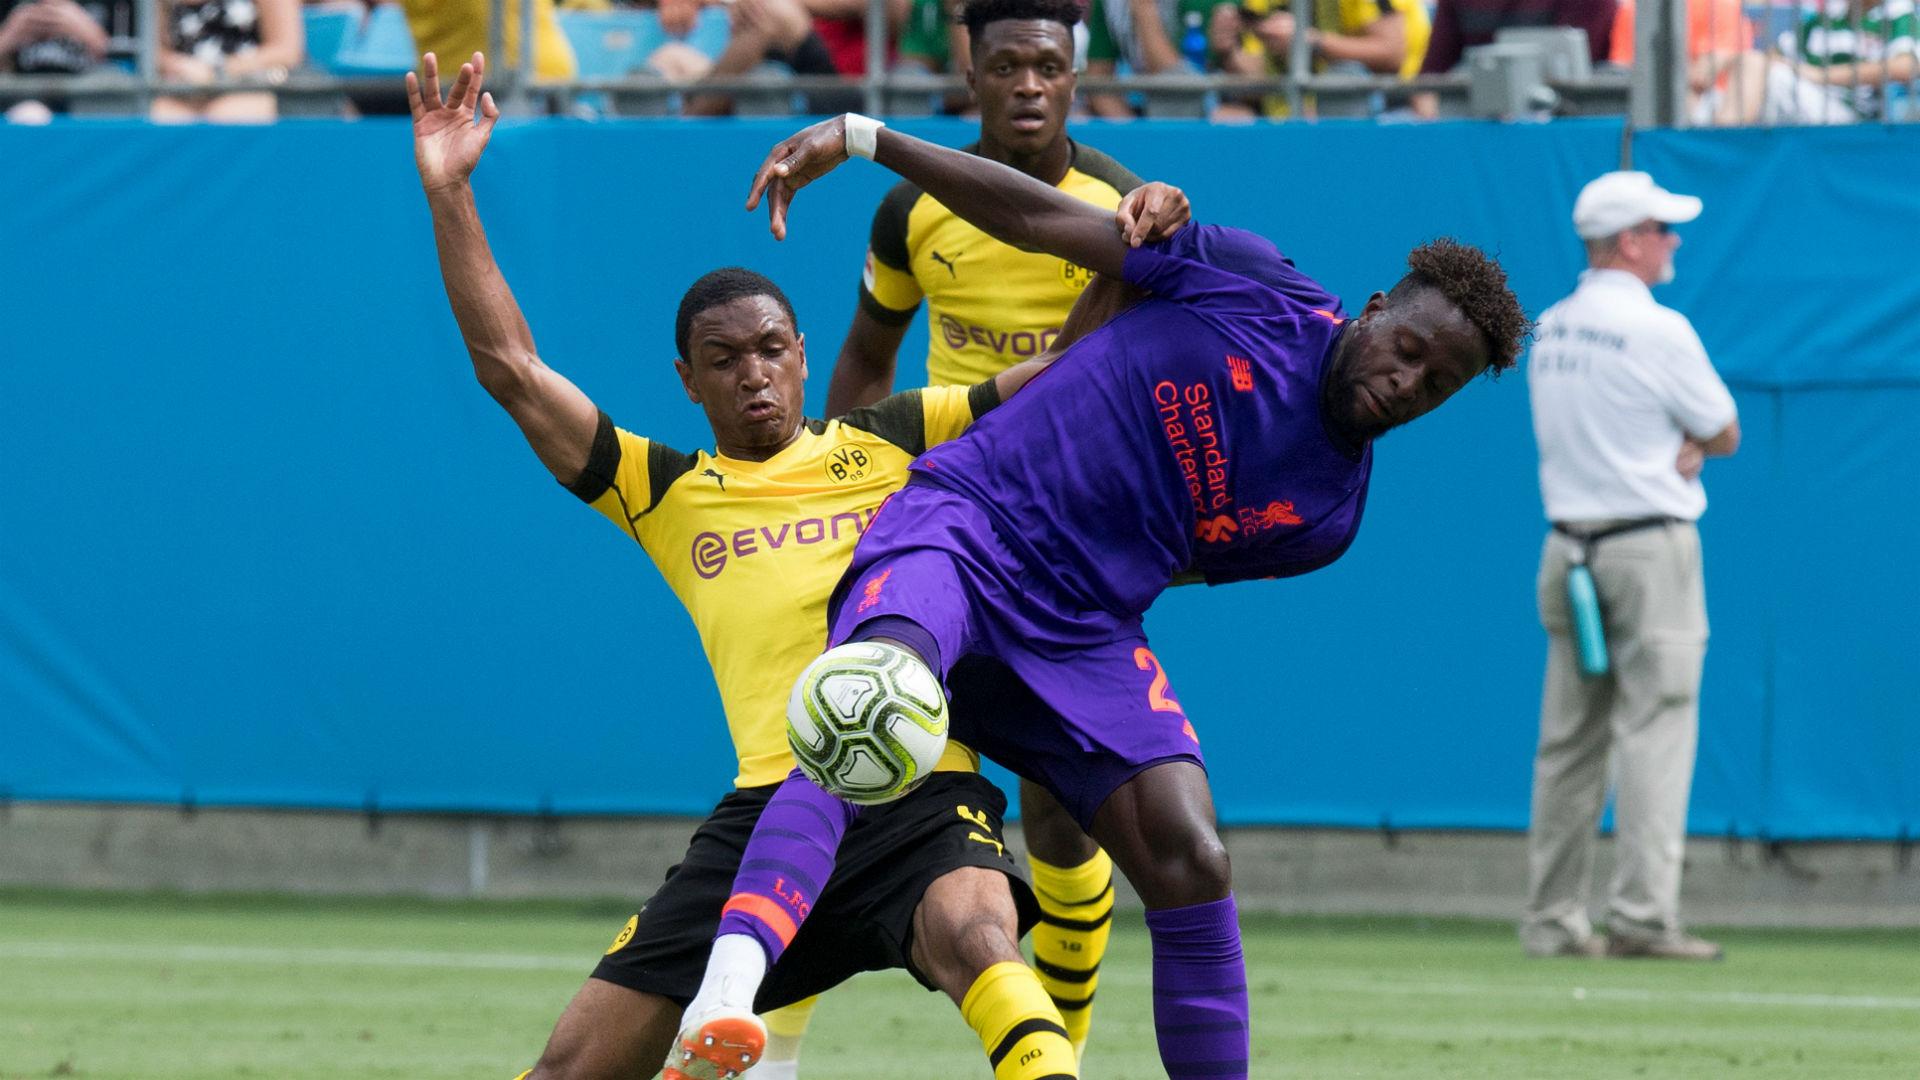 Divock Origi Abdou Diallo Liverpool Borussia Dortmund ICC 2018